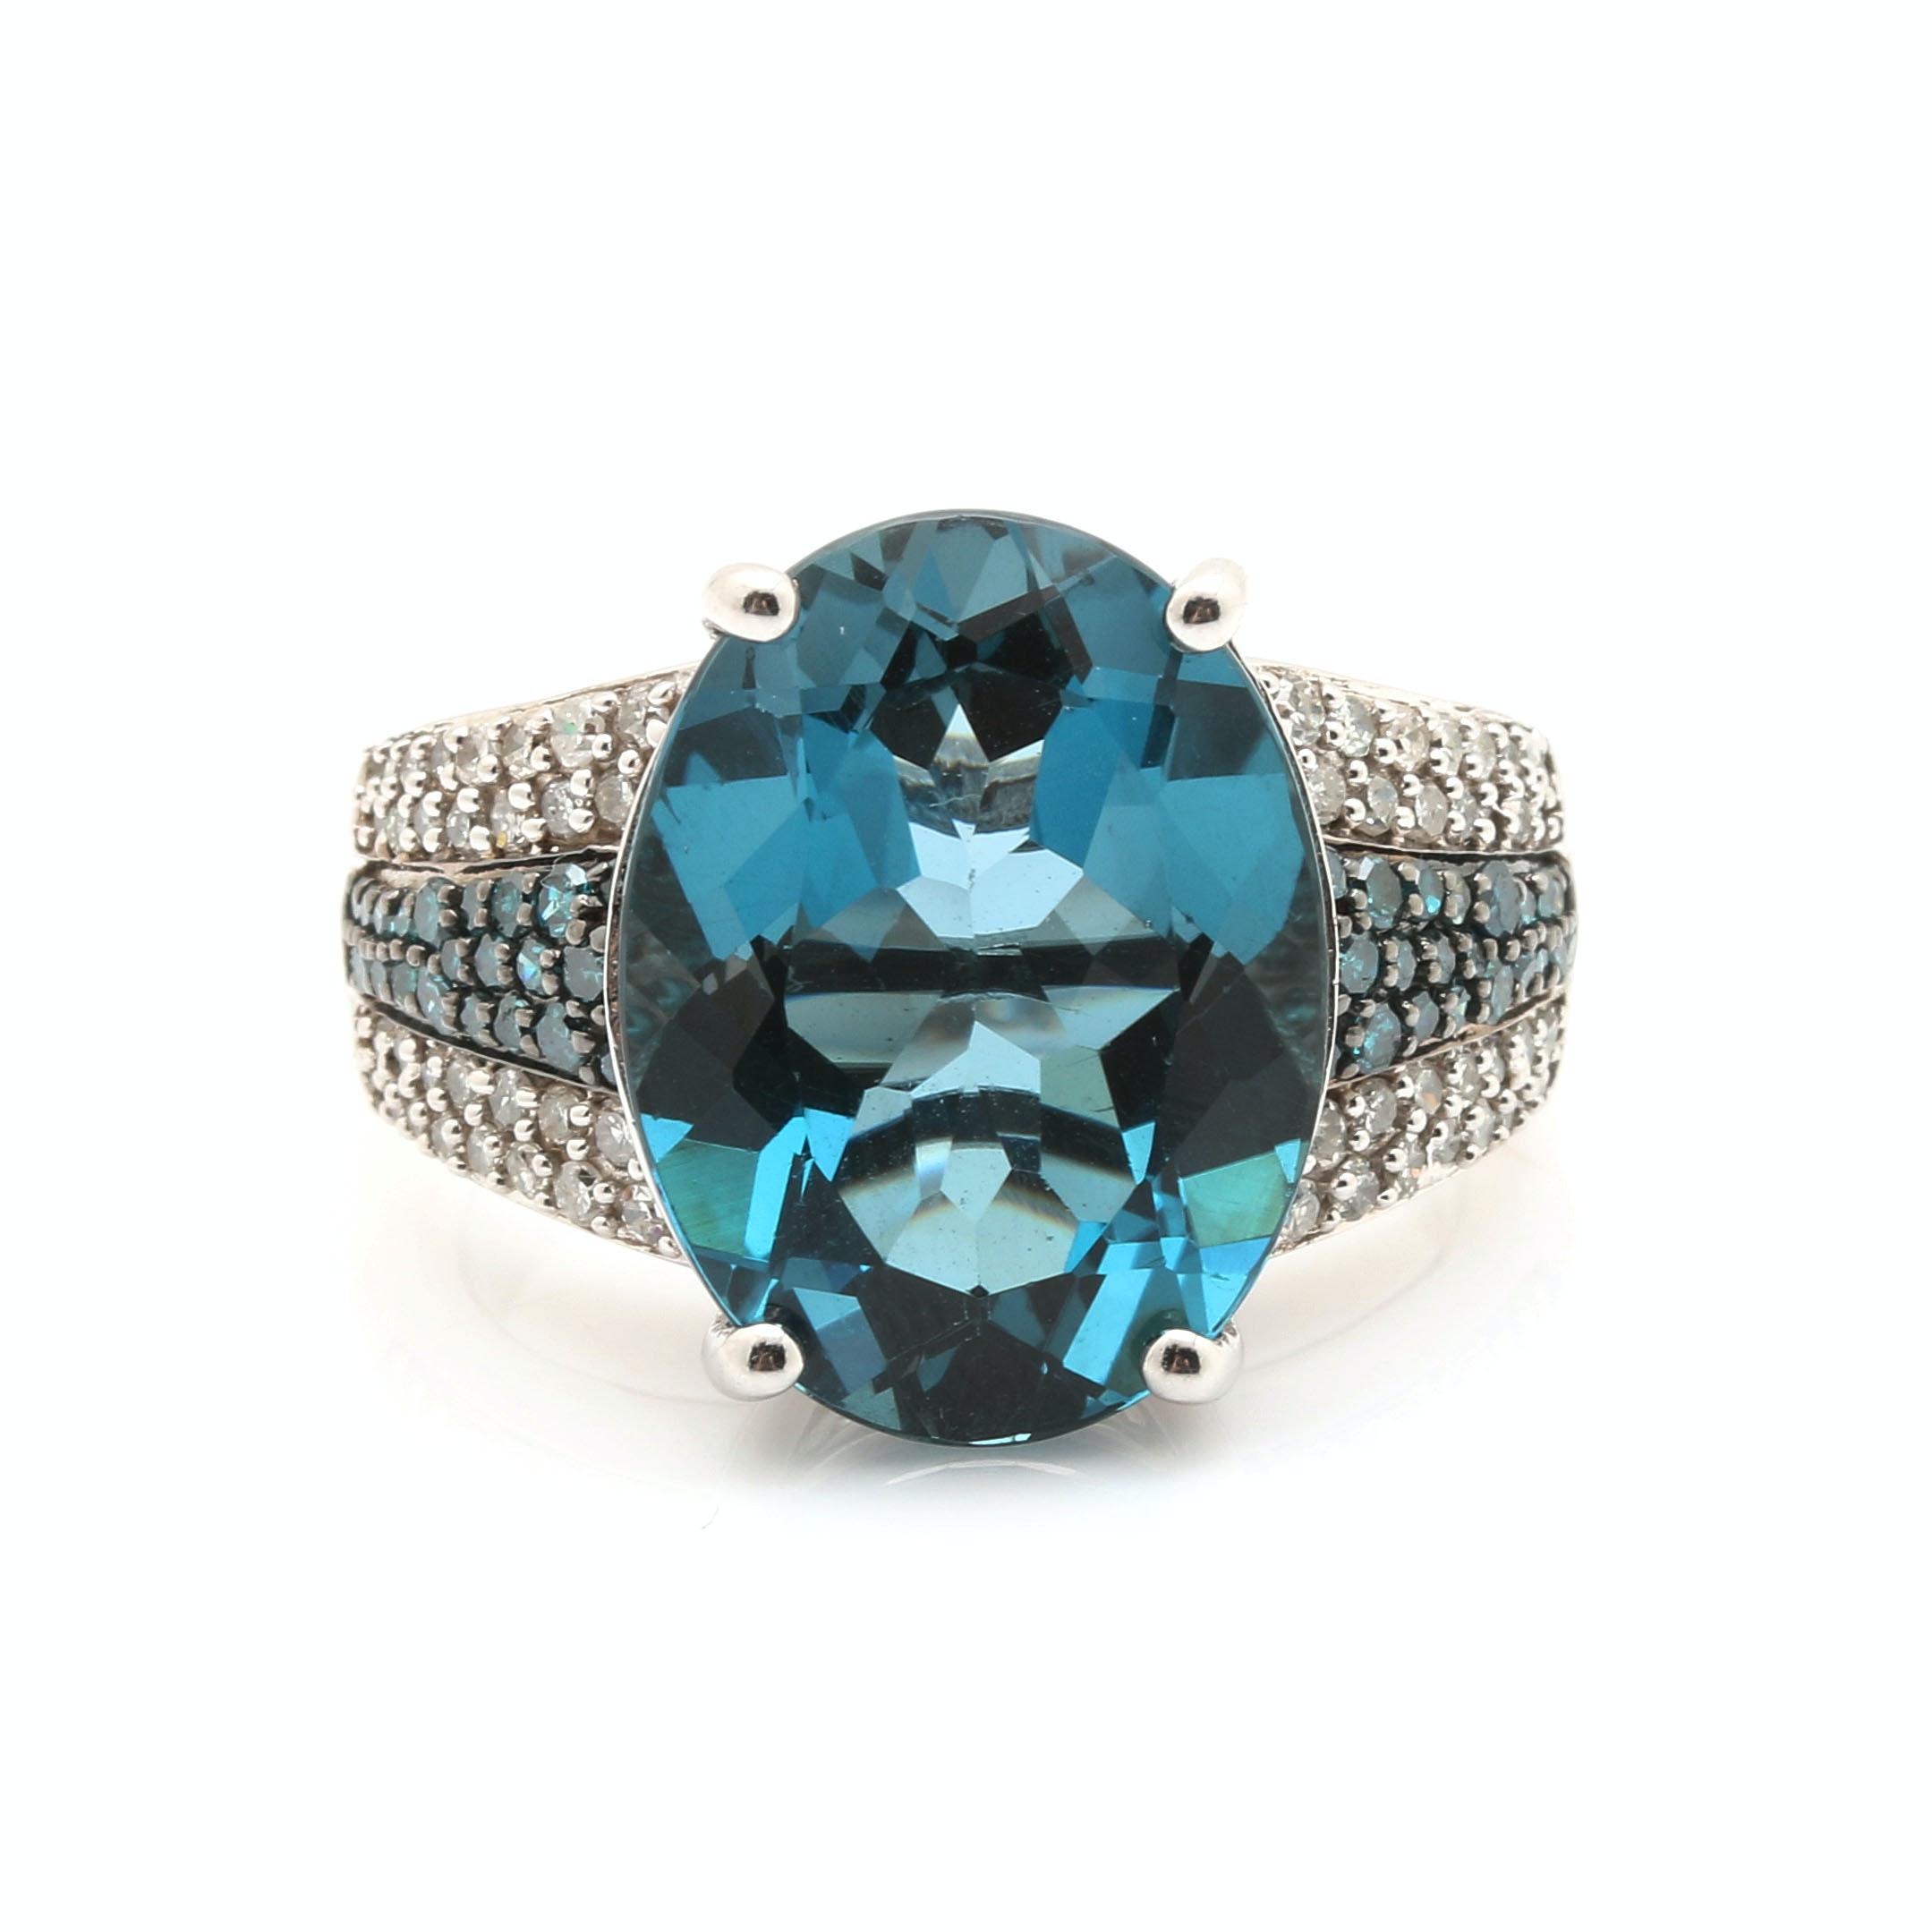 14K White Gold 10.12 CT Blue Topaz and Diamond Ring